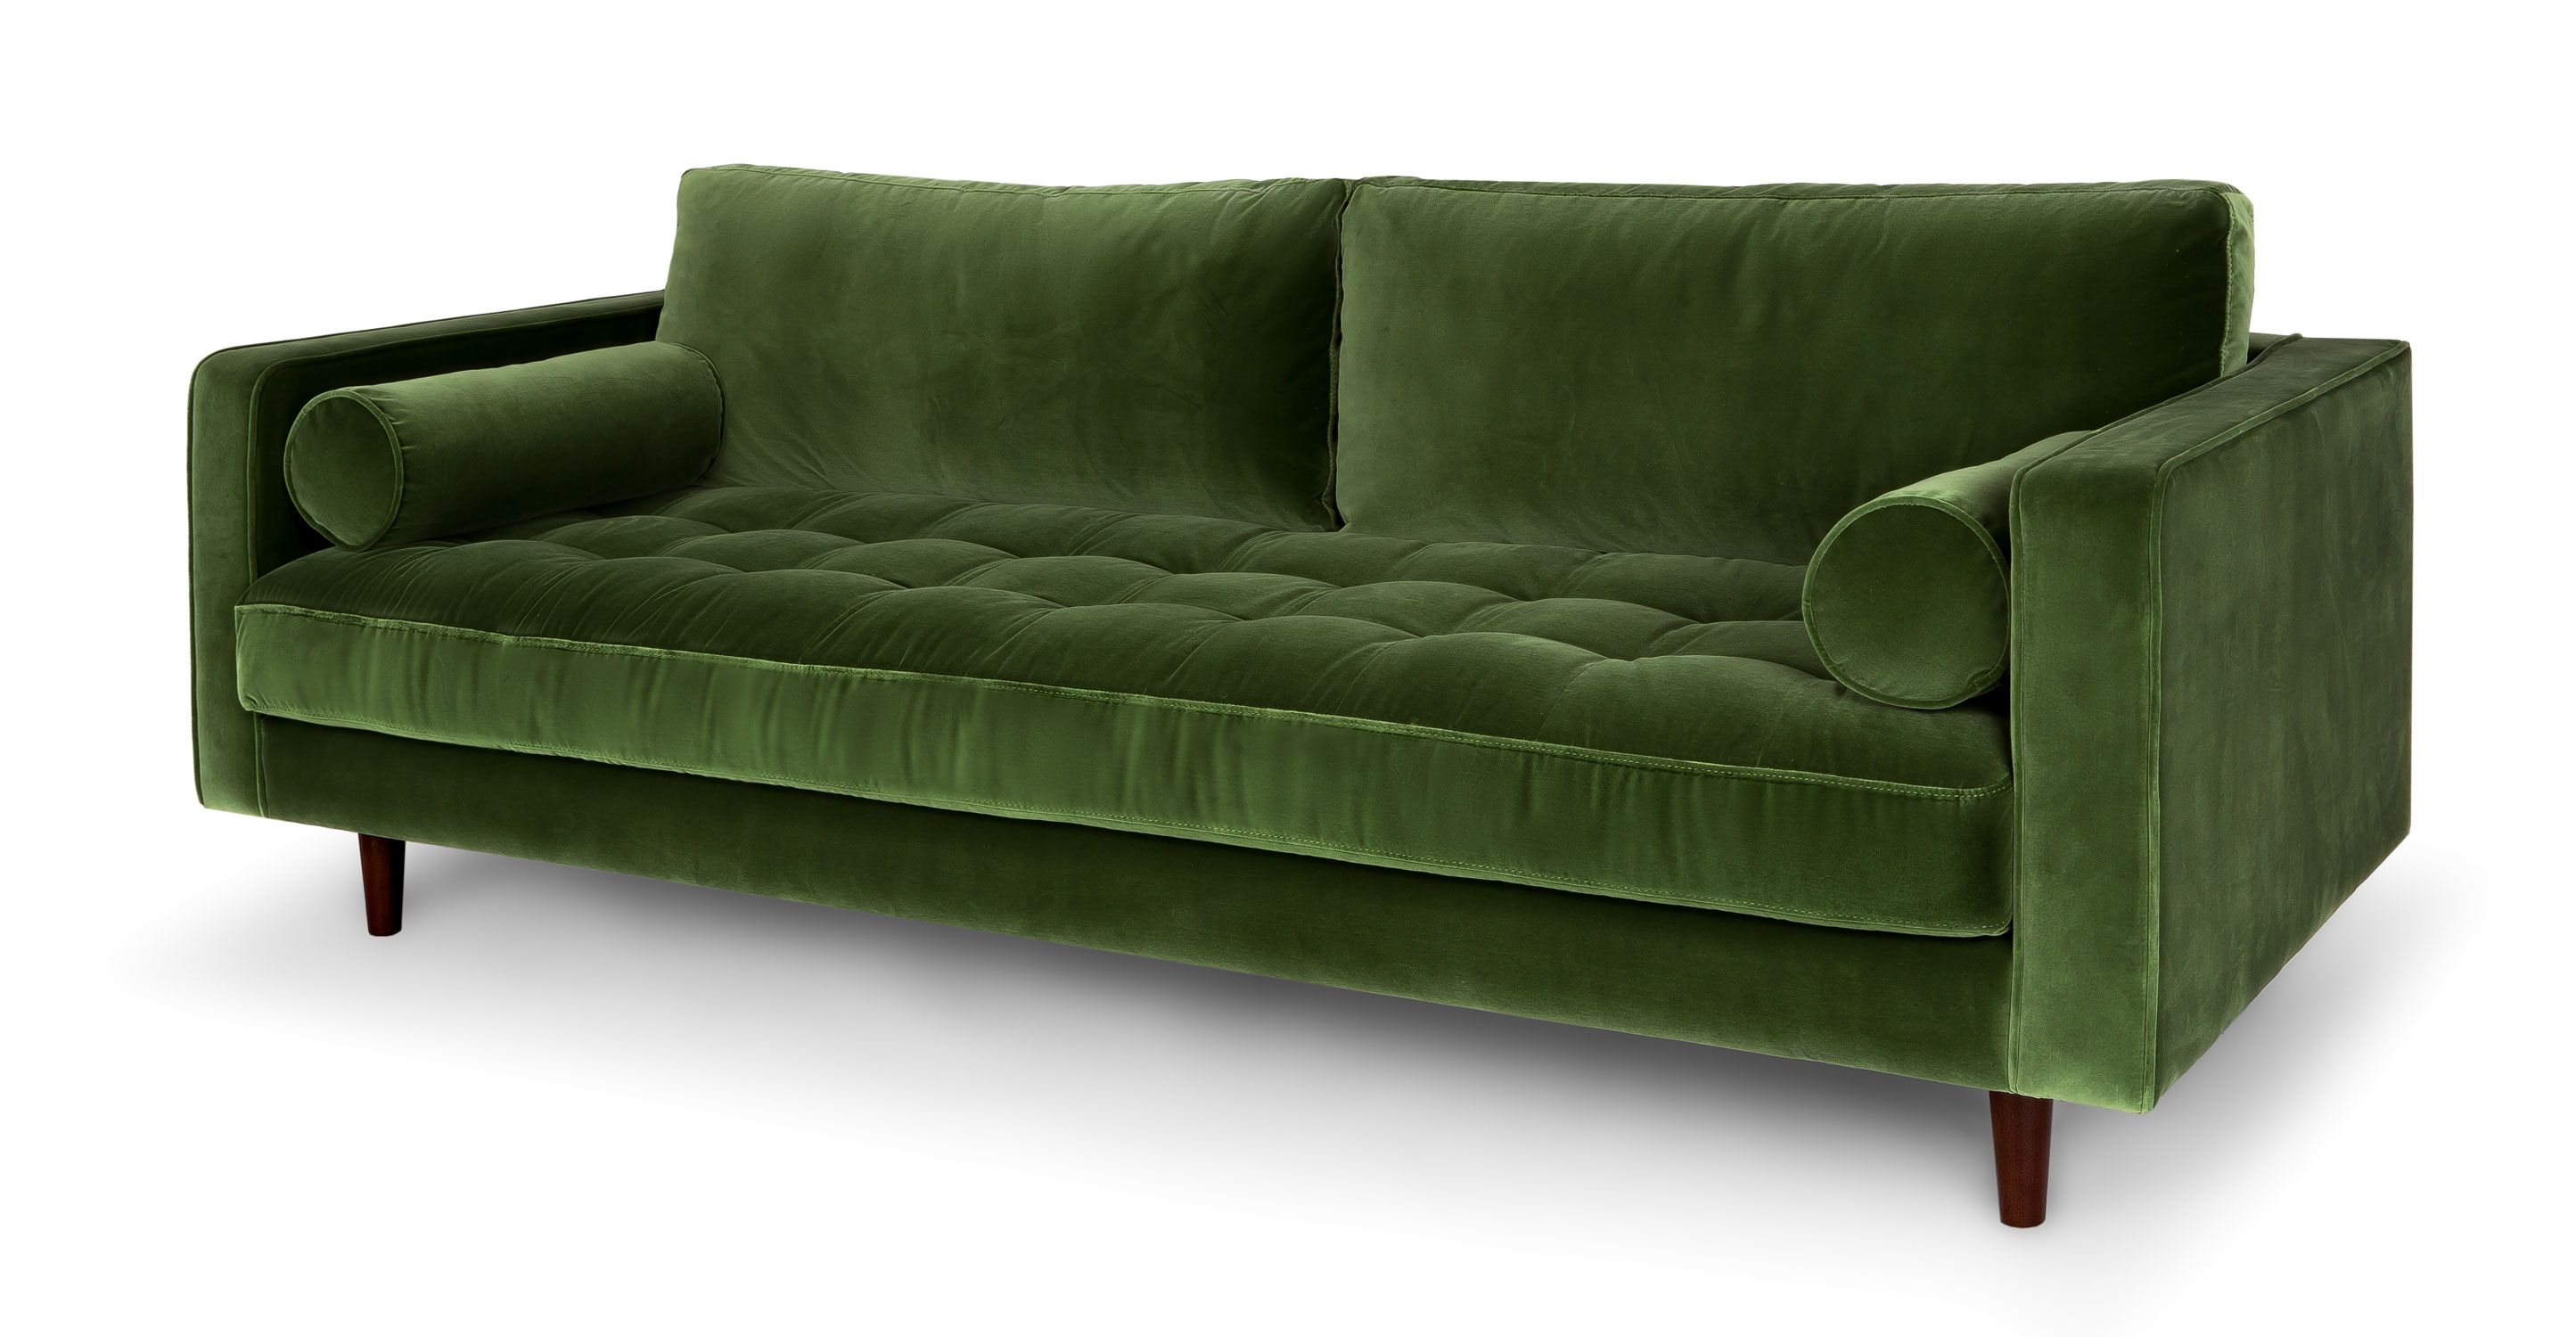 Strange Sven Grass Green Sofa Home Sweet Home In Eclectic Modern Forskolin Free Trial Chair Design Images Forskolin Free Trialorg